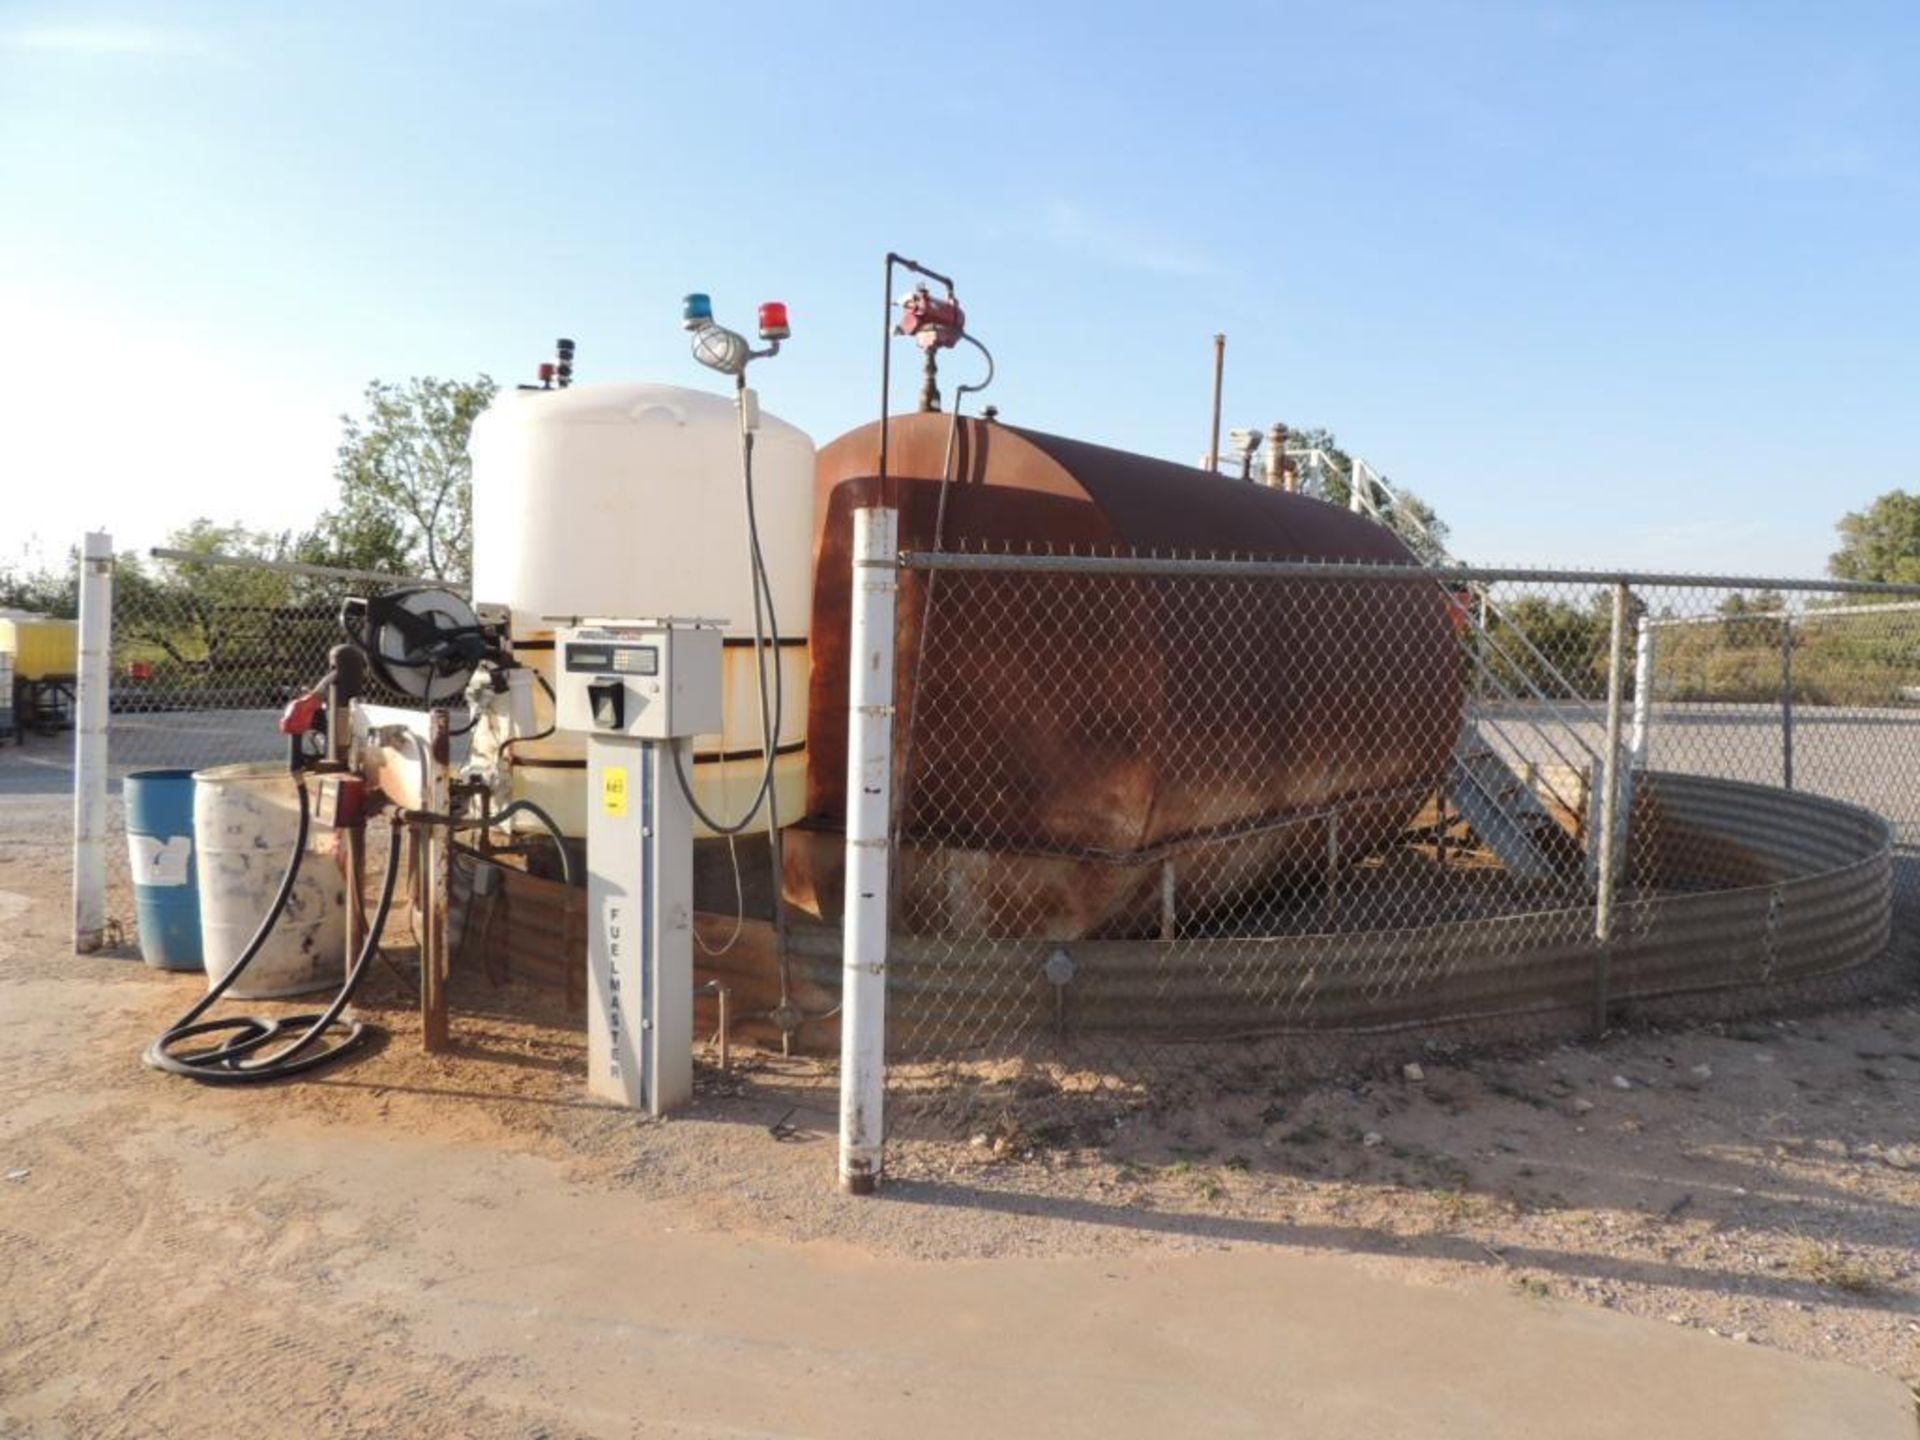 Fuel Island 8200 Gallon Steel Tank, Fuel Master Plus PrOK.ee Management System, Fill-Rite Series 900